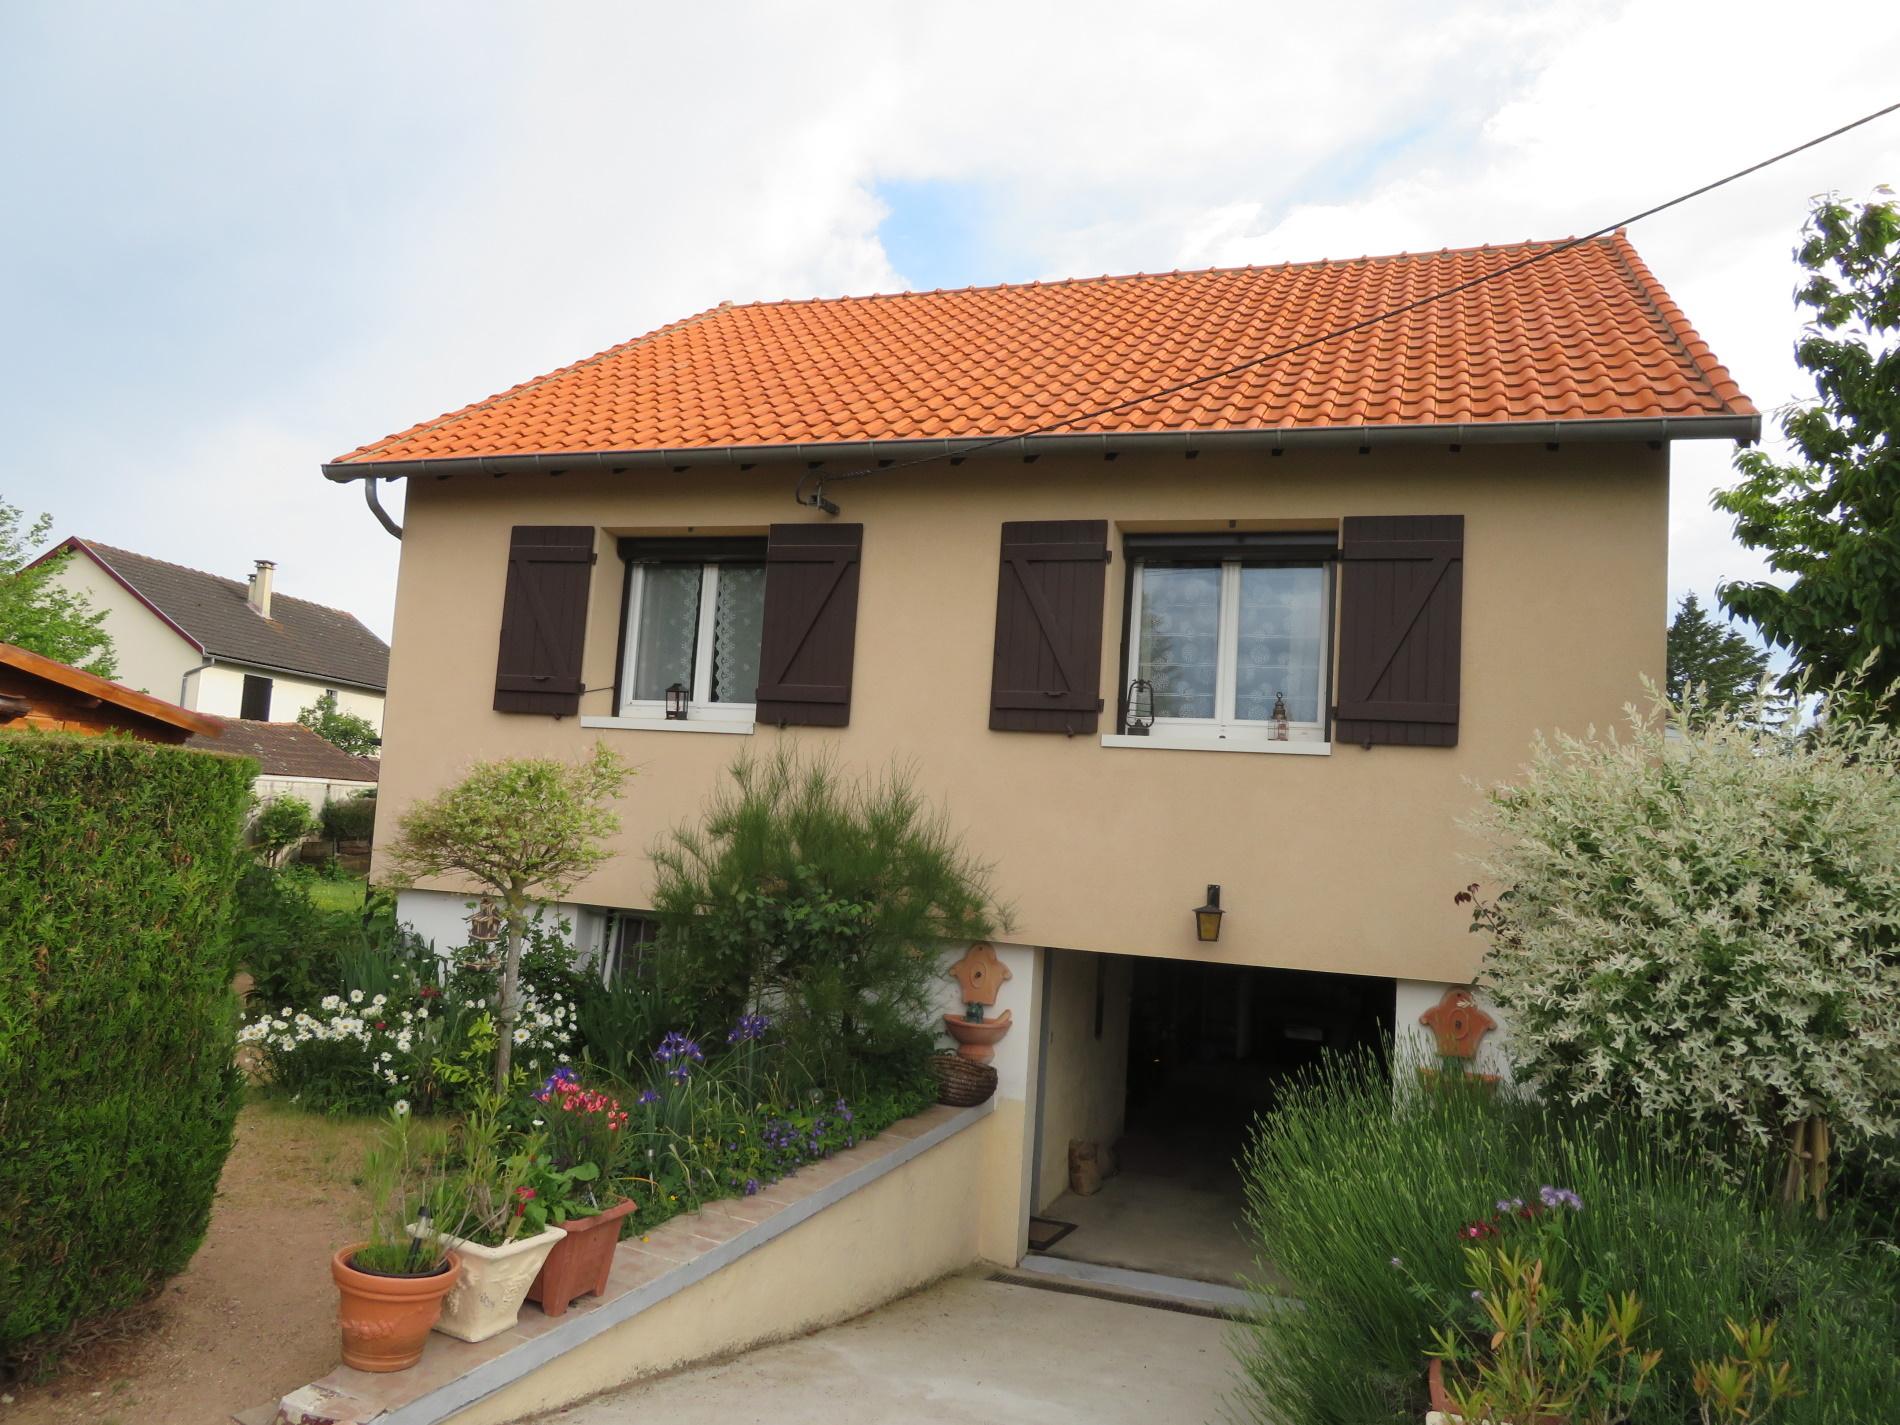 Villa 4 pièces avec jardin, proche Vichy